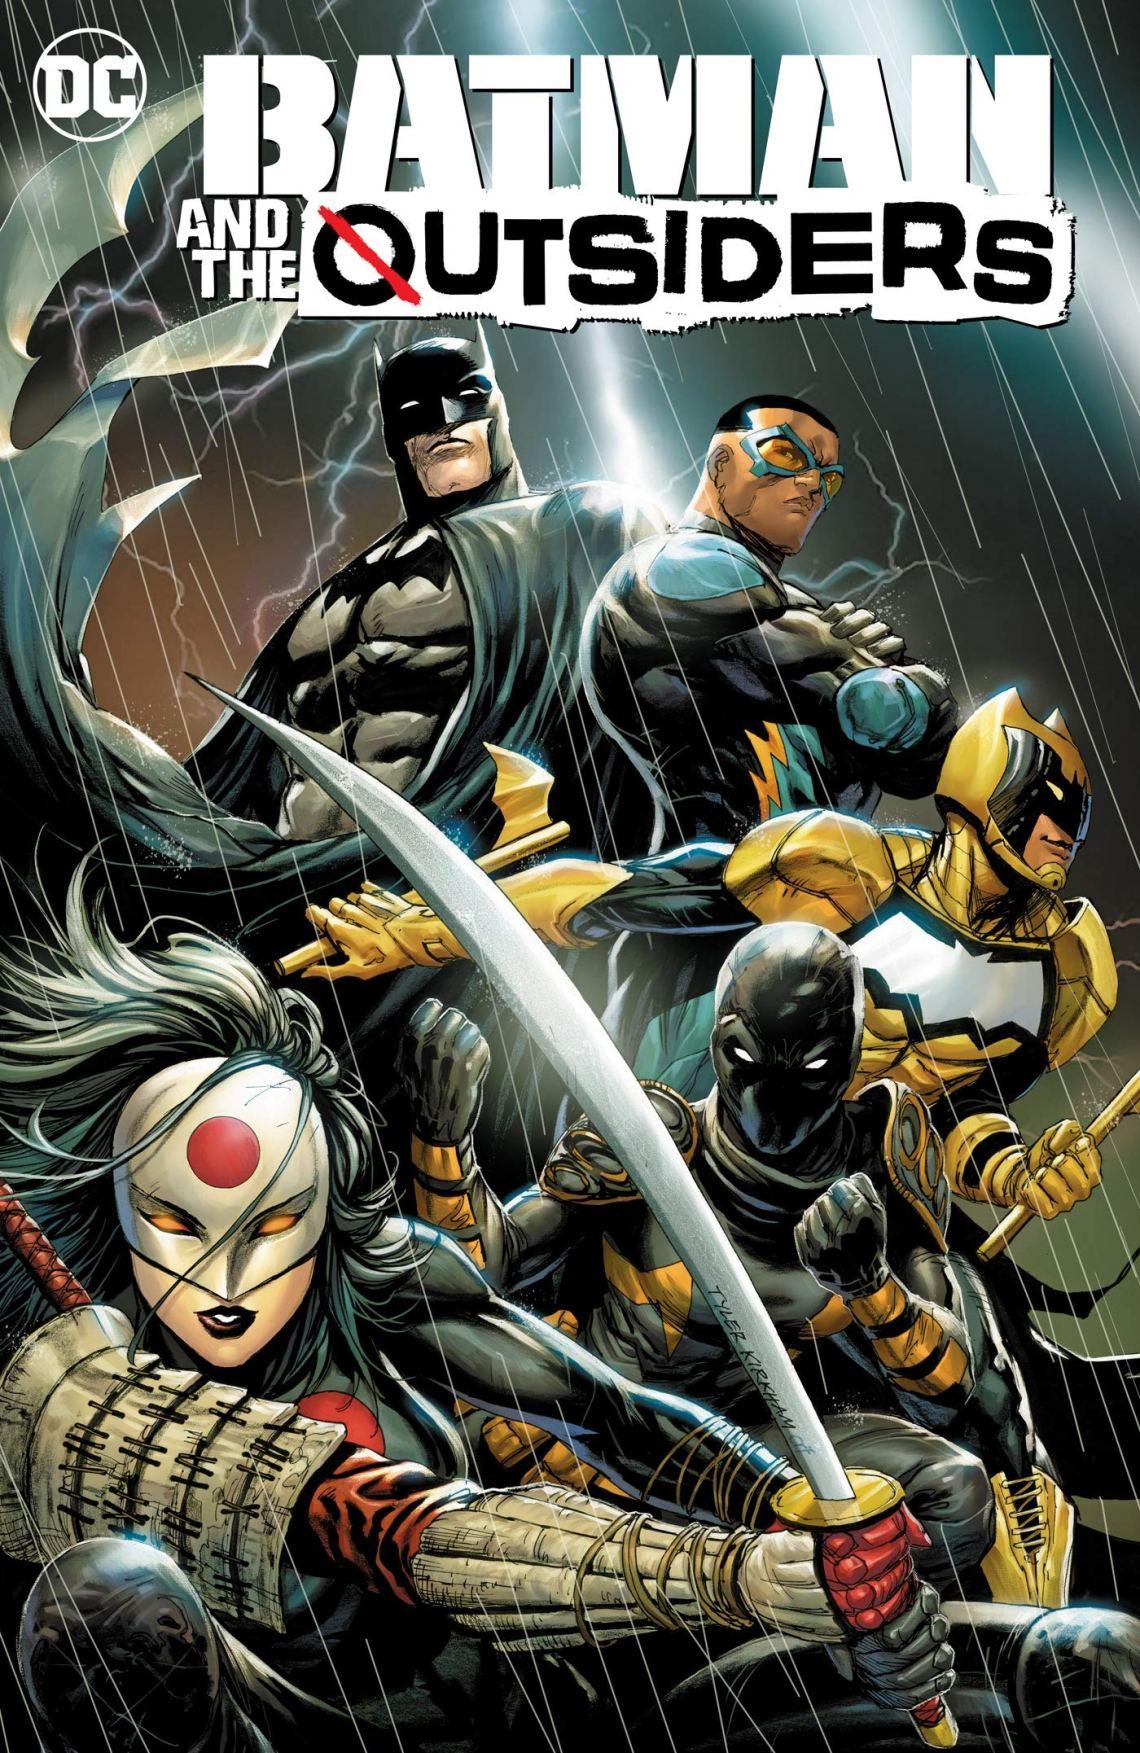 Amazon.com: Batman and the Outsiders Vol. 1: Lesser Gods (9781401291785):  Hill, Bryan, Soy, Dexter: Books